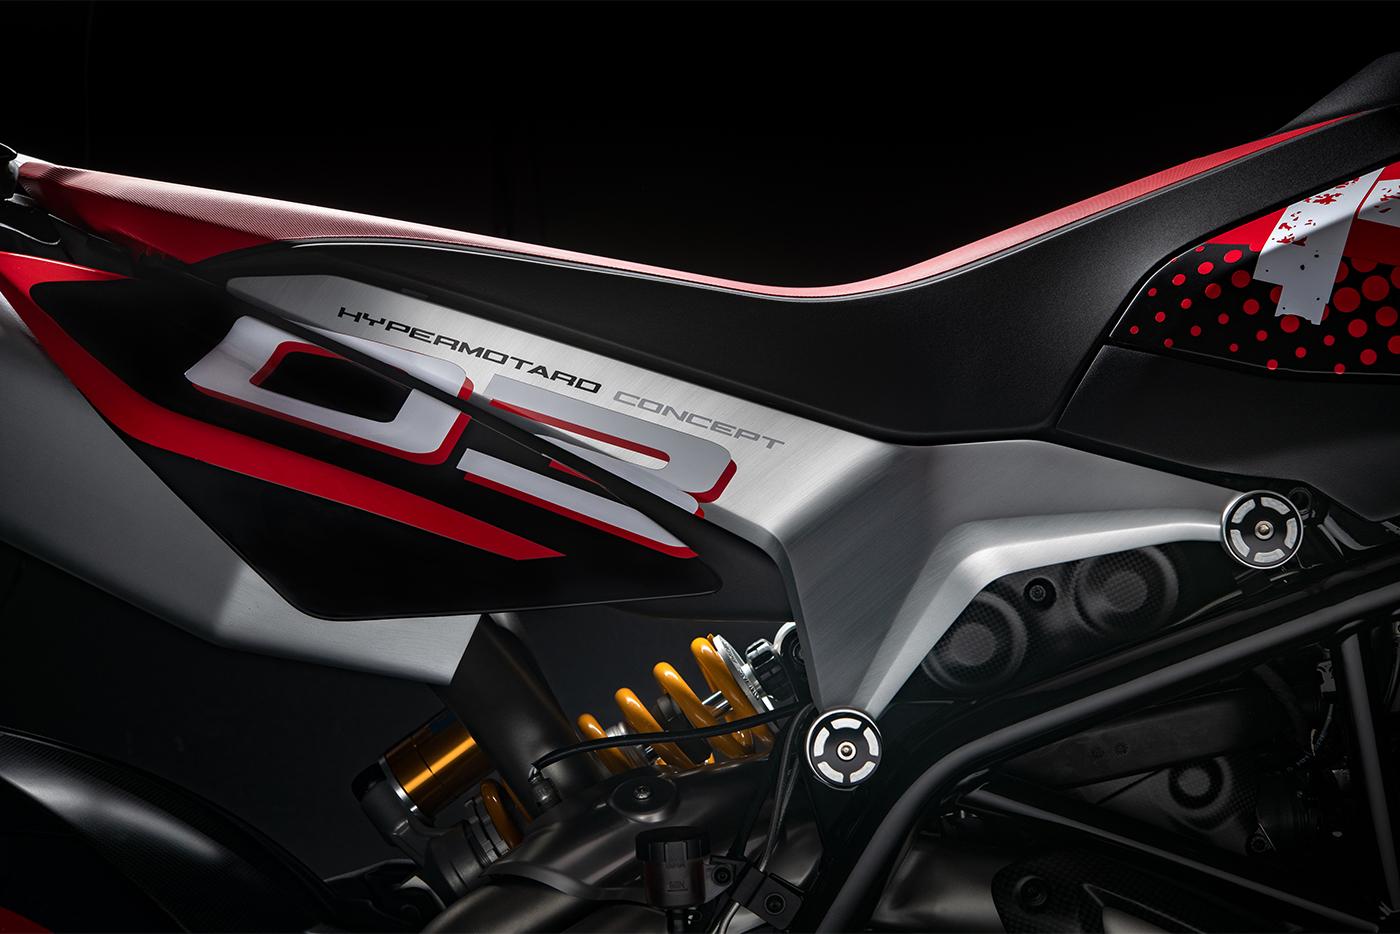 2019-ducati-hypermotard-950-concept-7.jpg